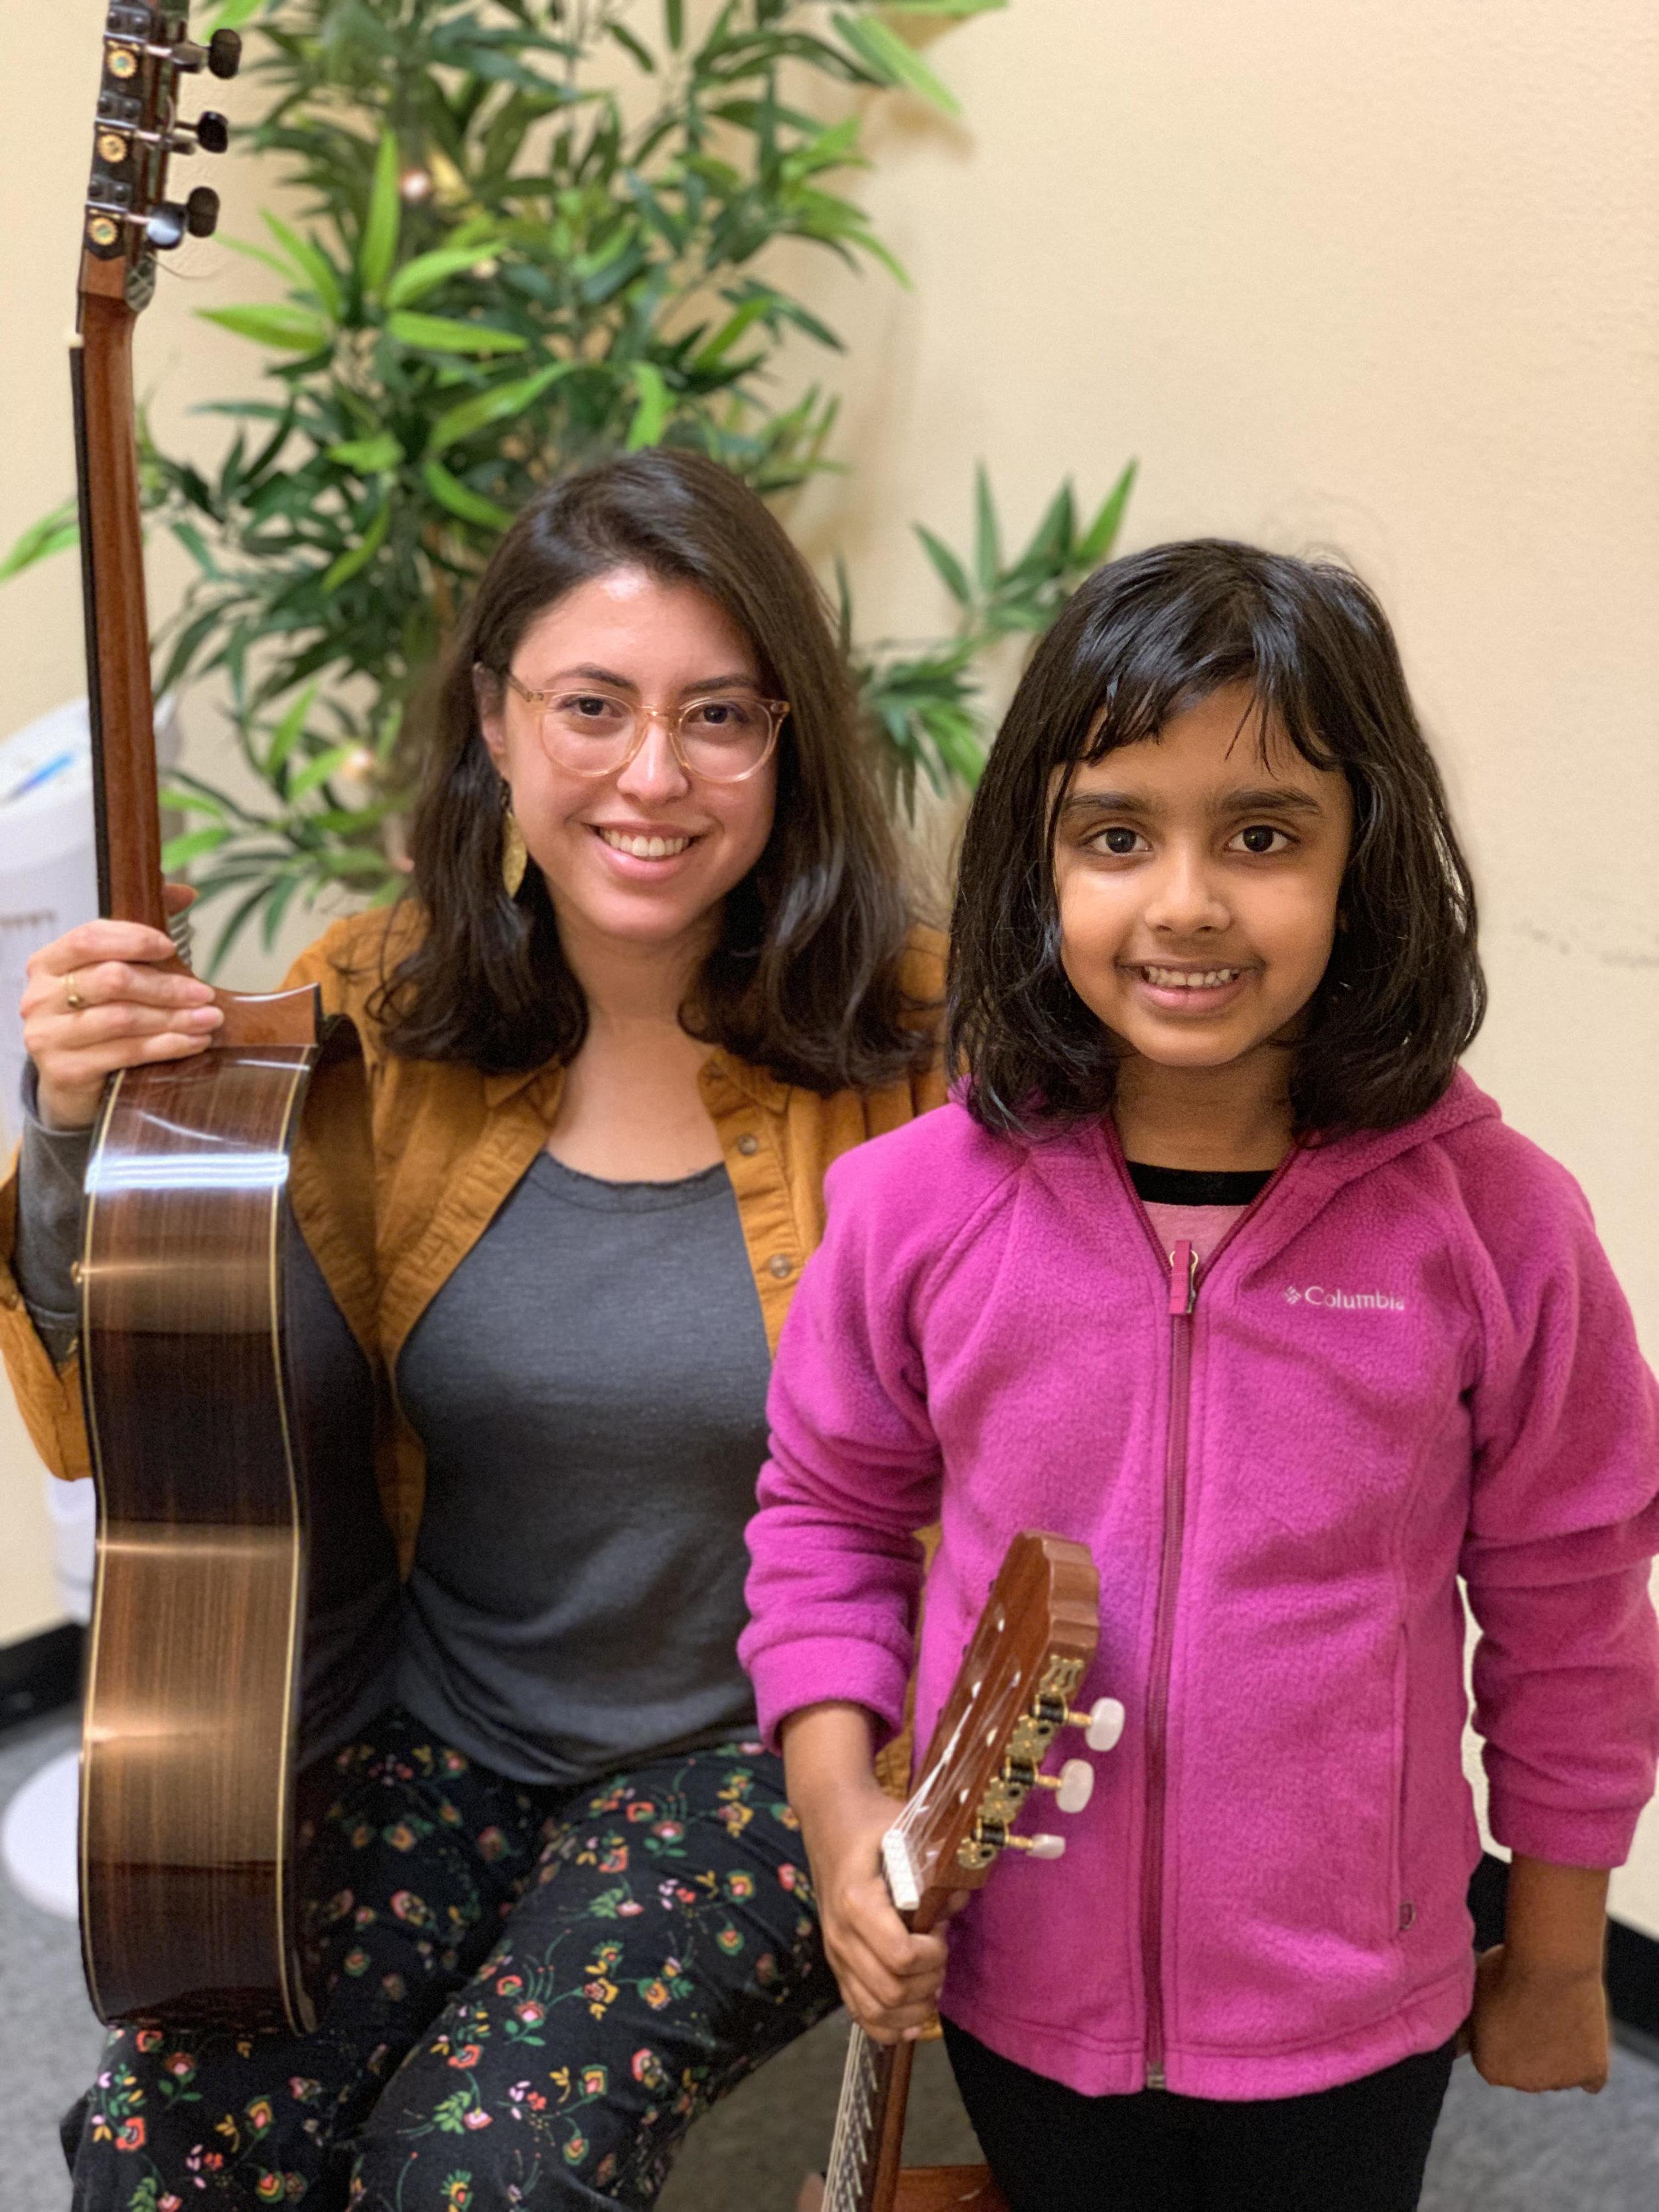 CCM Student Shanaya at her Santa Clara Music Lessons studying guitar